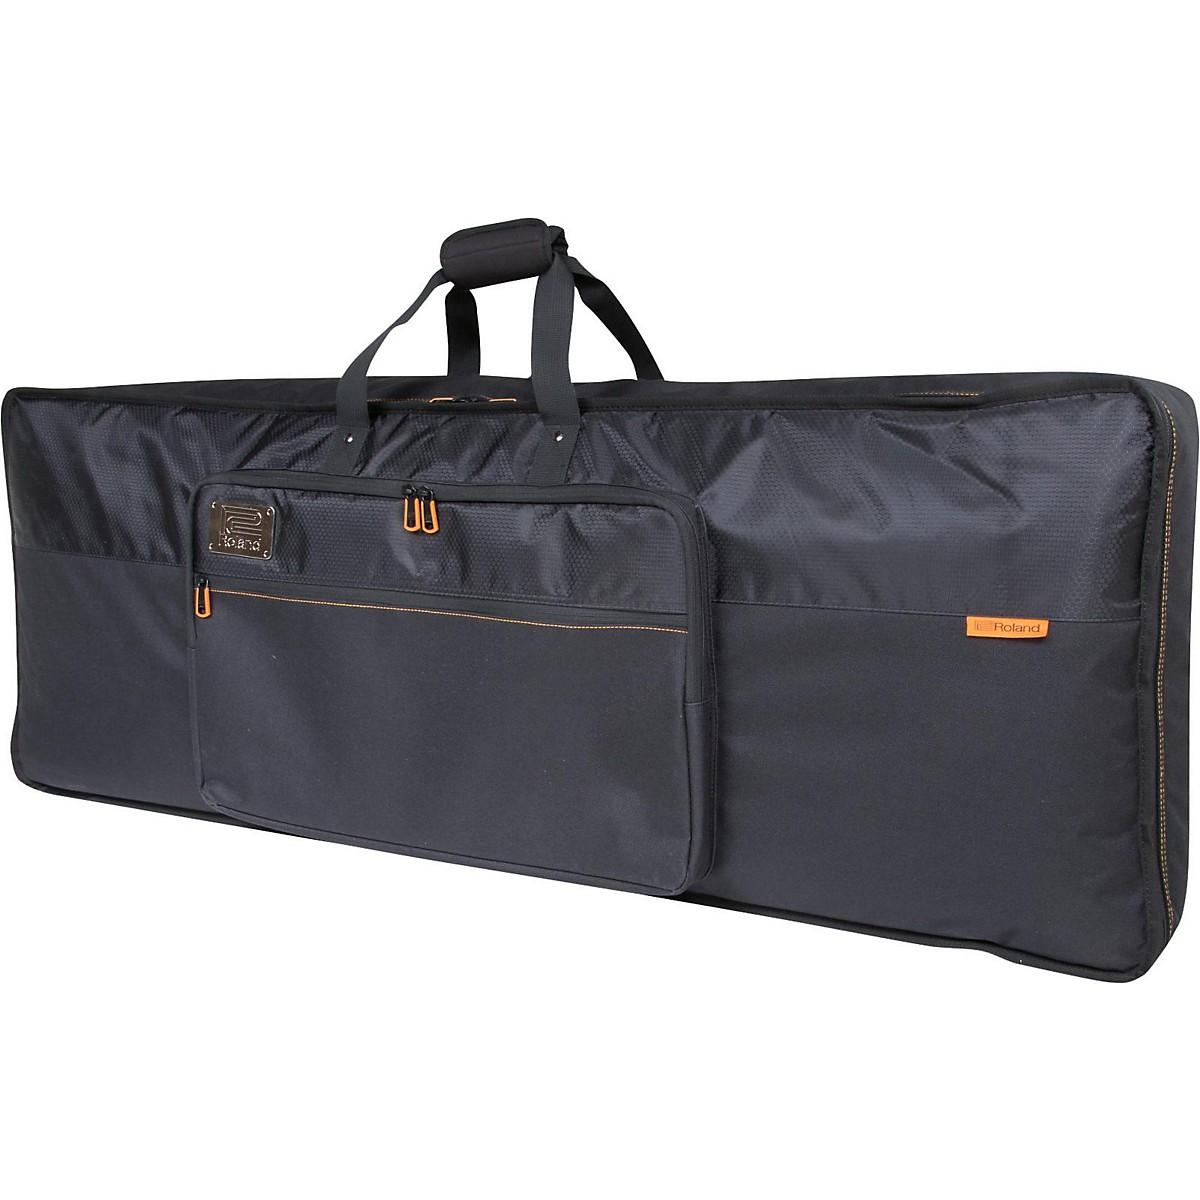 Roland Black Series Keyboard Bag - Small